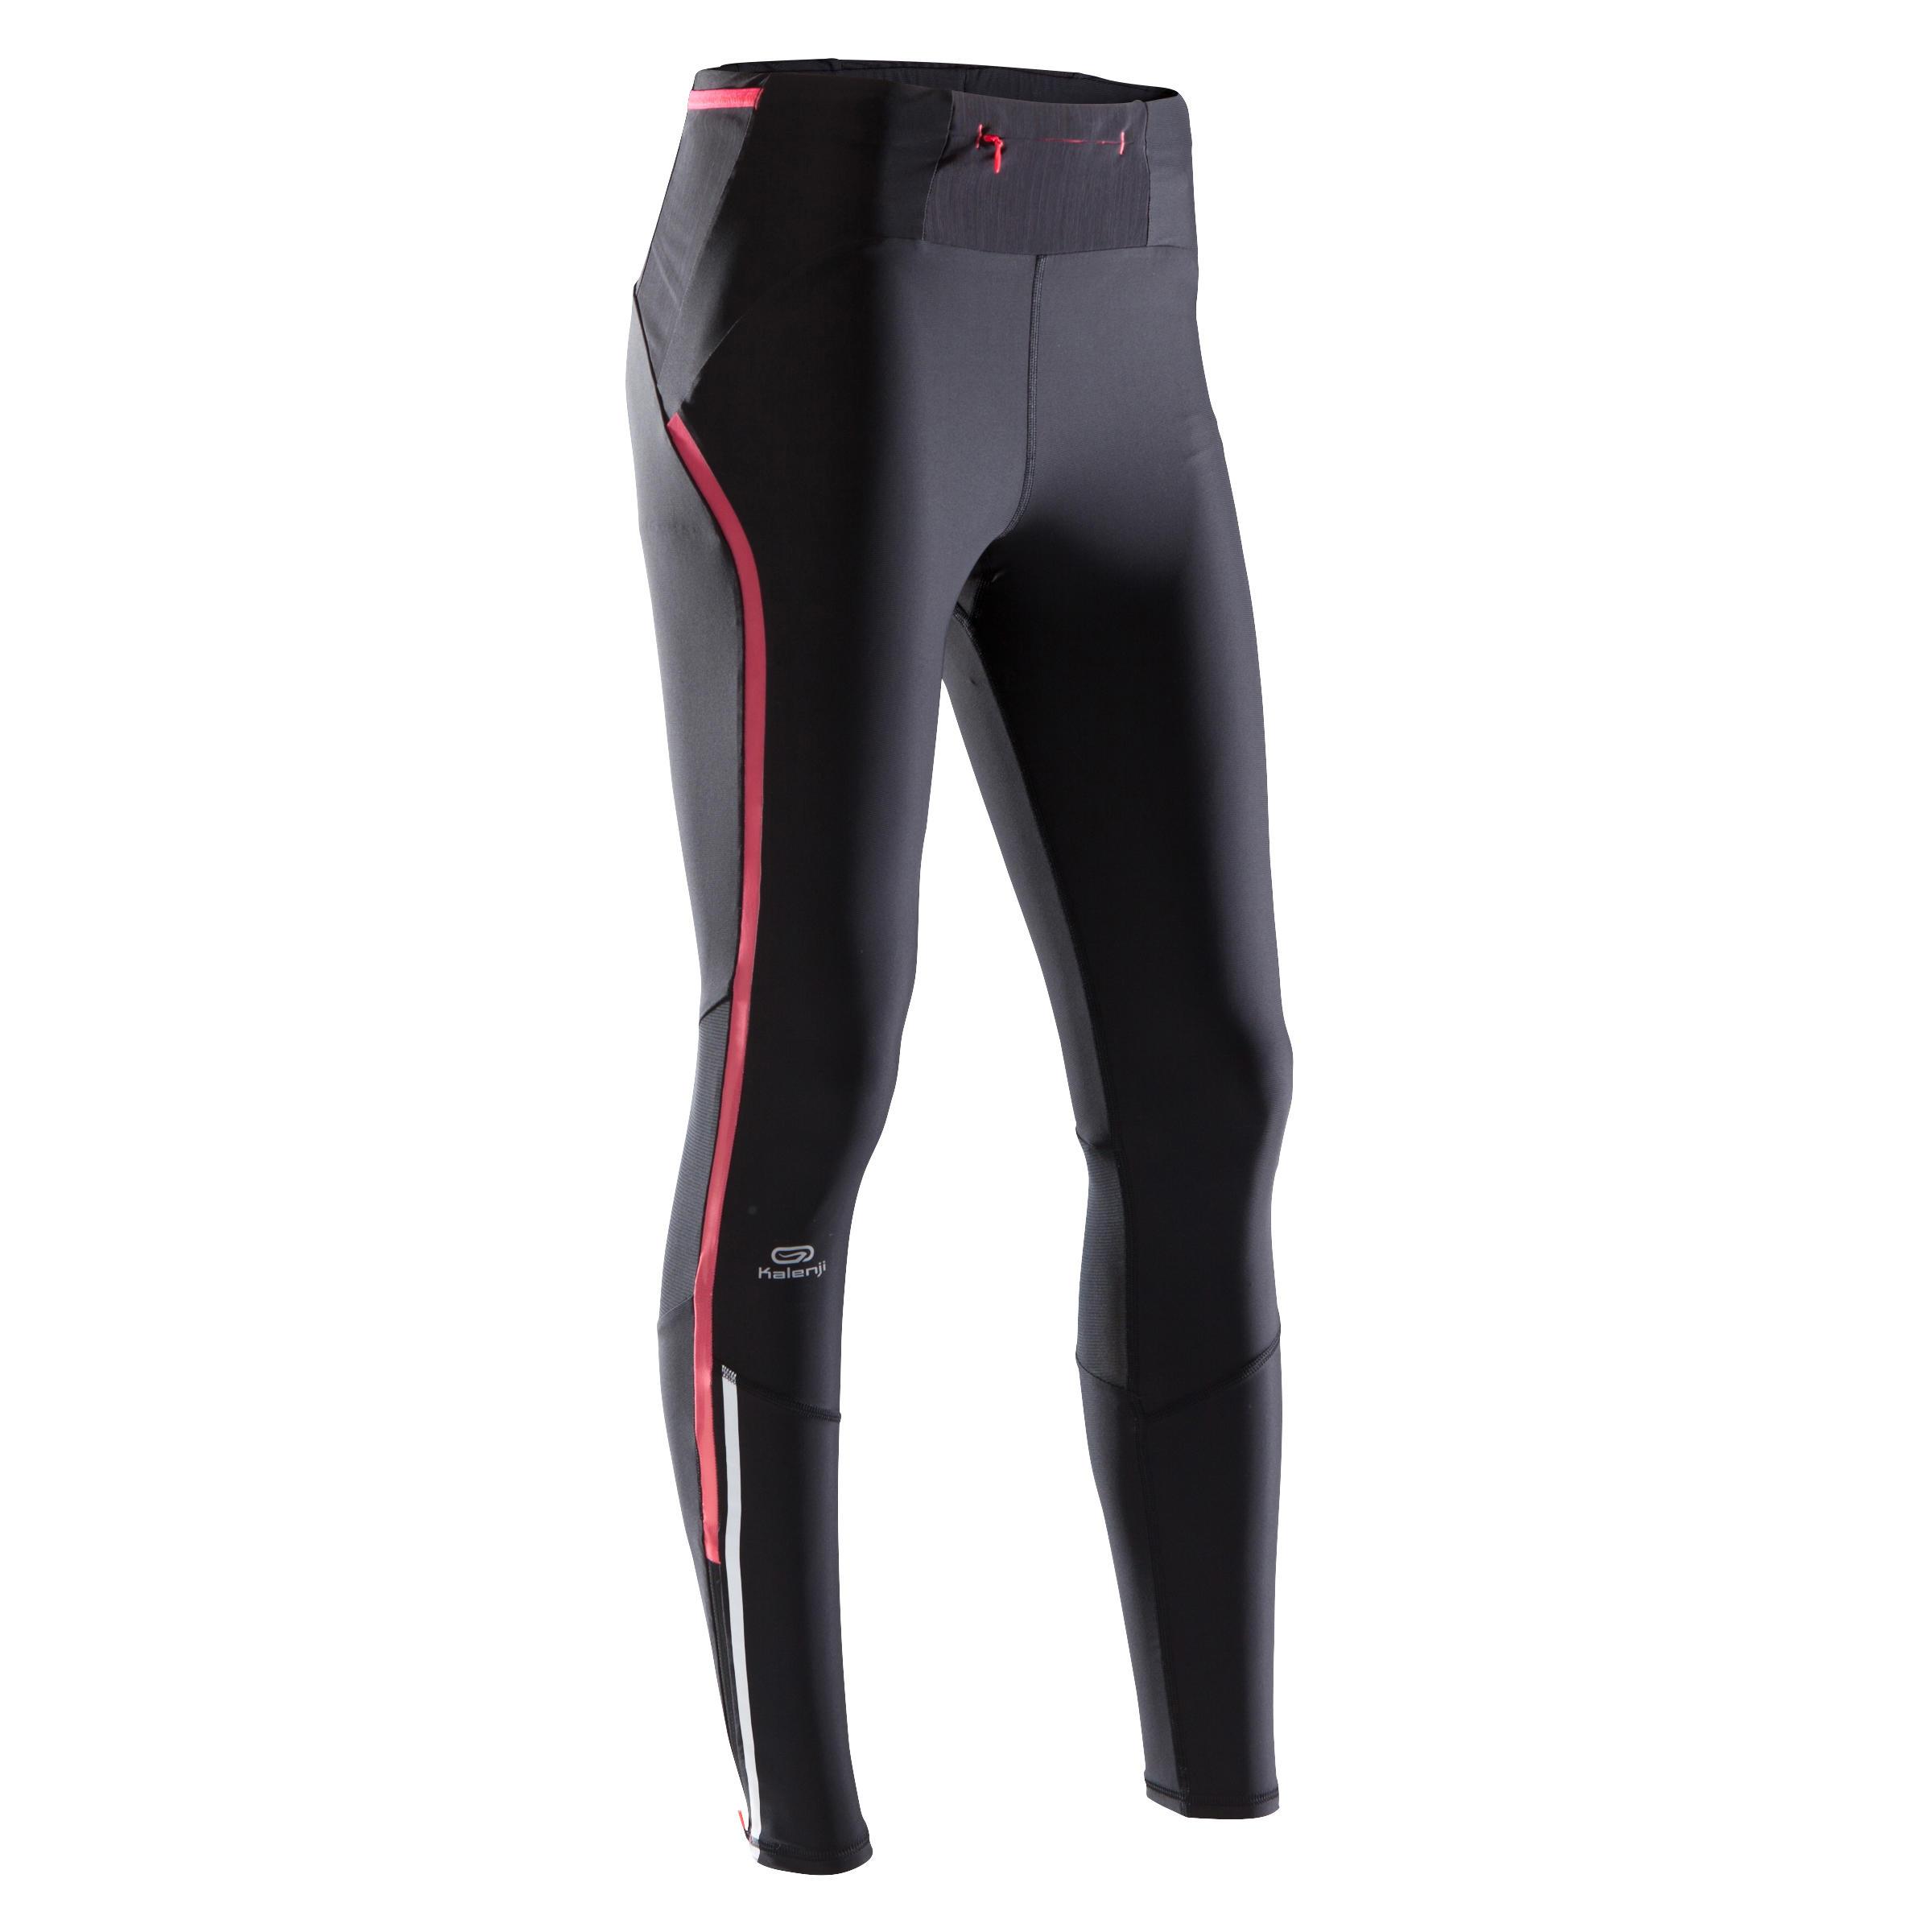 Laufhose lang Tights Kompression Kiprun Damen schwarz/rosa | Sportbekleidung > Sporthosen > Laufhosen | Schwarz - Rot - Rosa | Kalenji